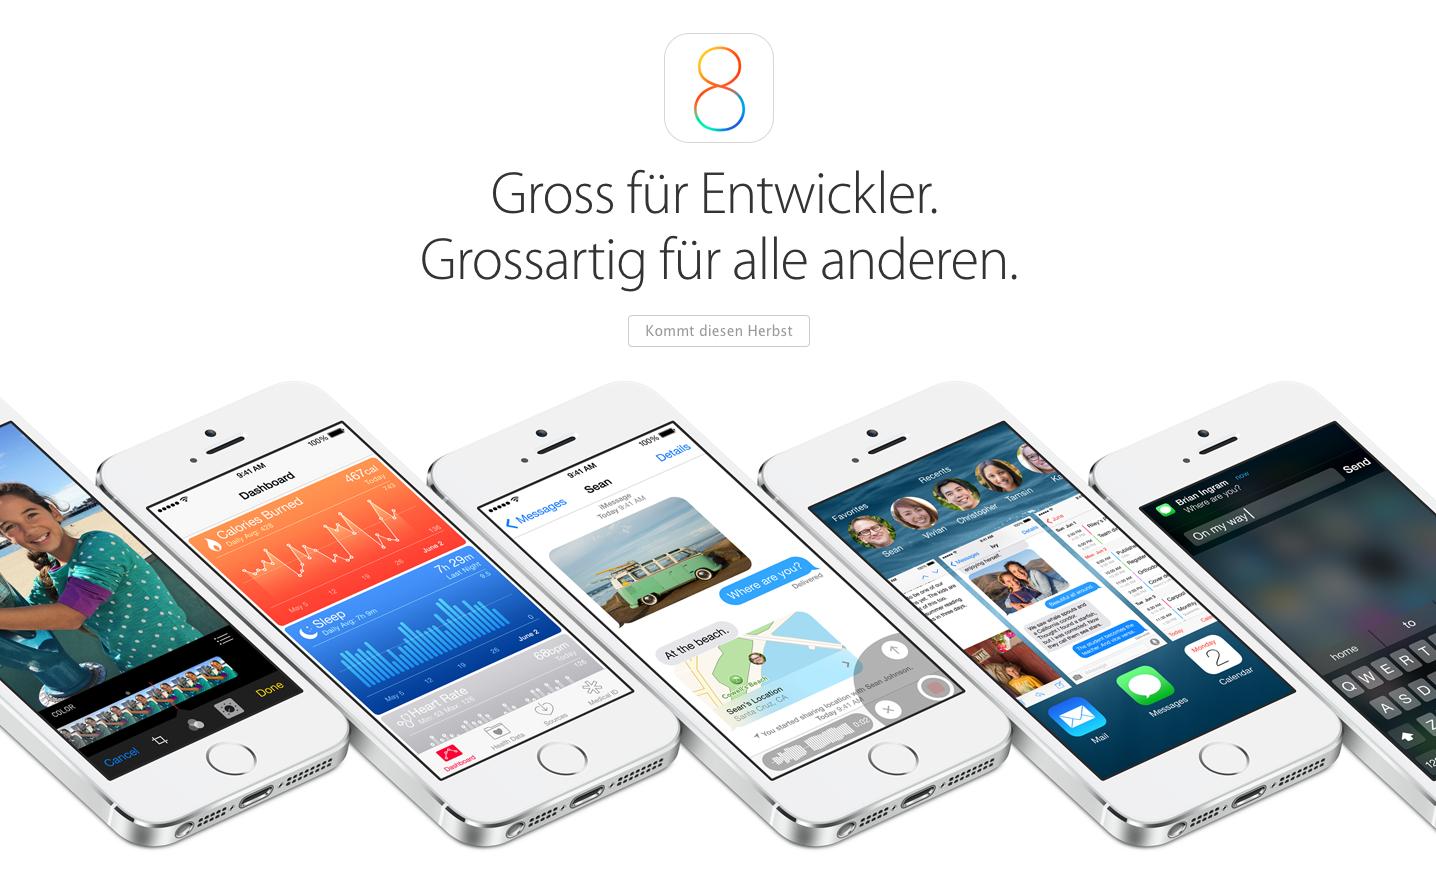 Heute: iOS 8.